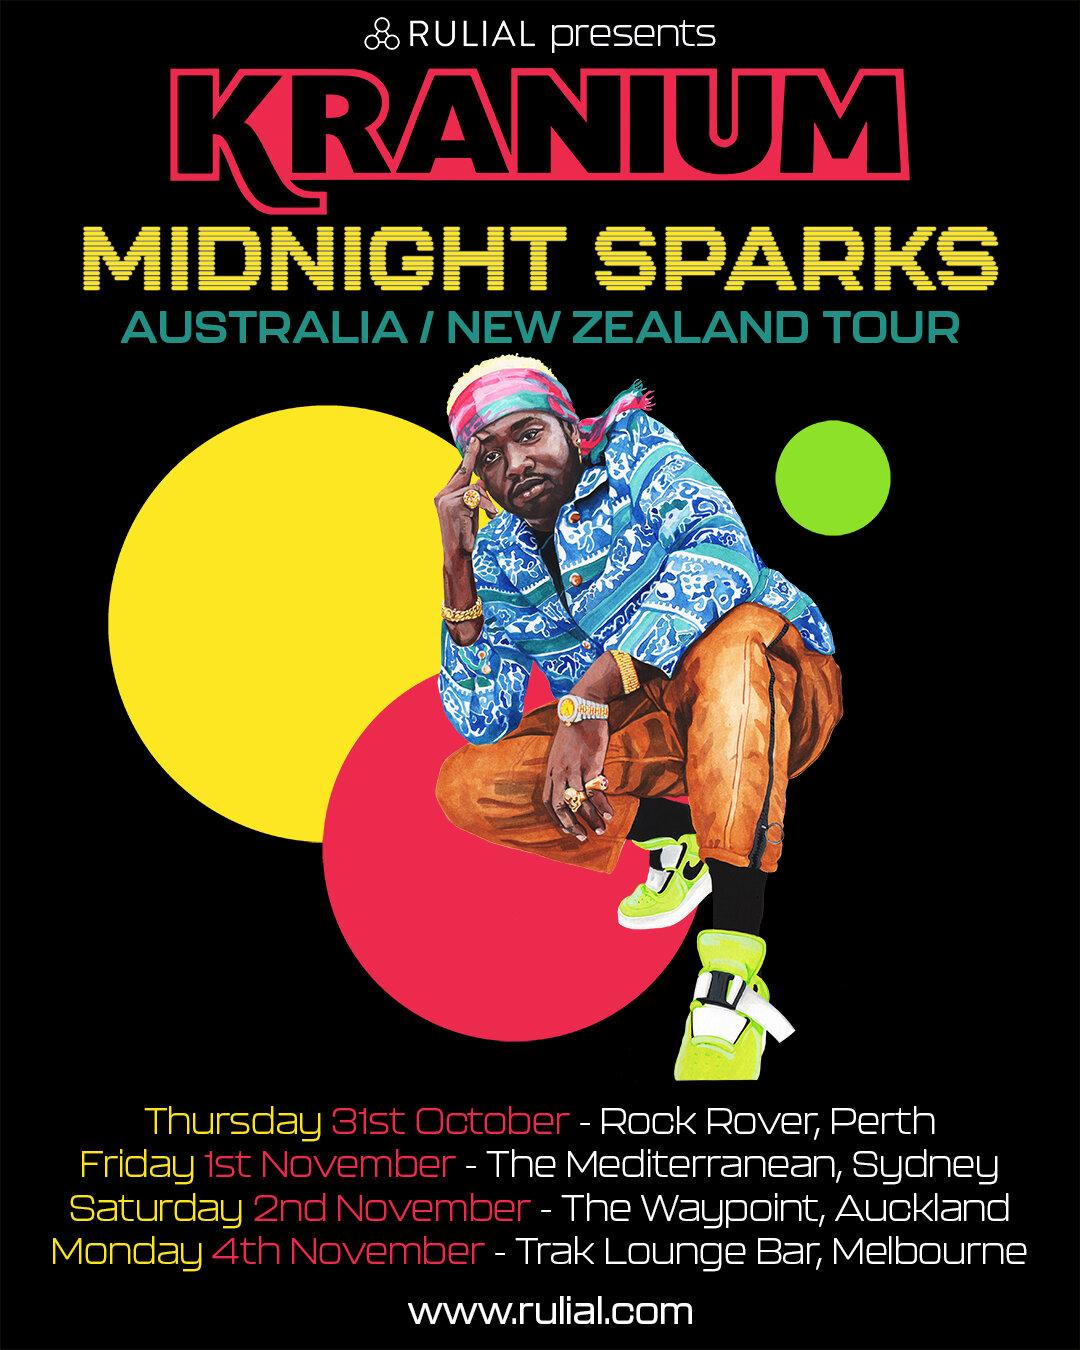 Kranium - Midnight Sparks Australia / NZ Tour